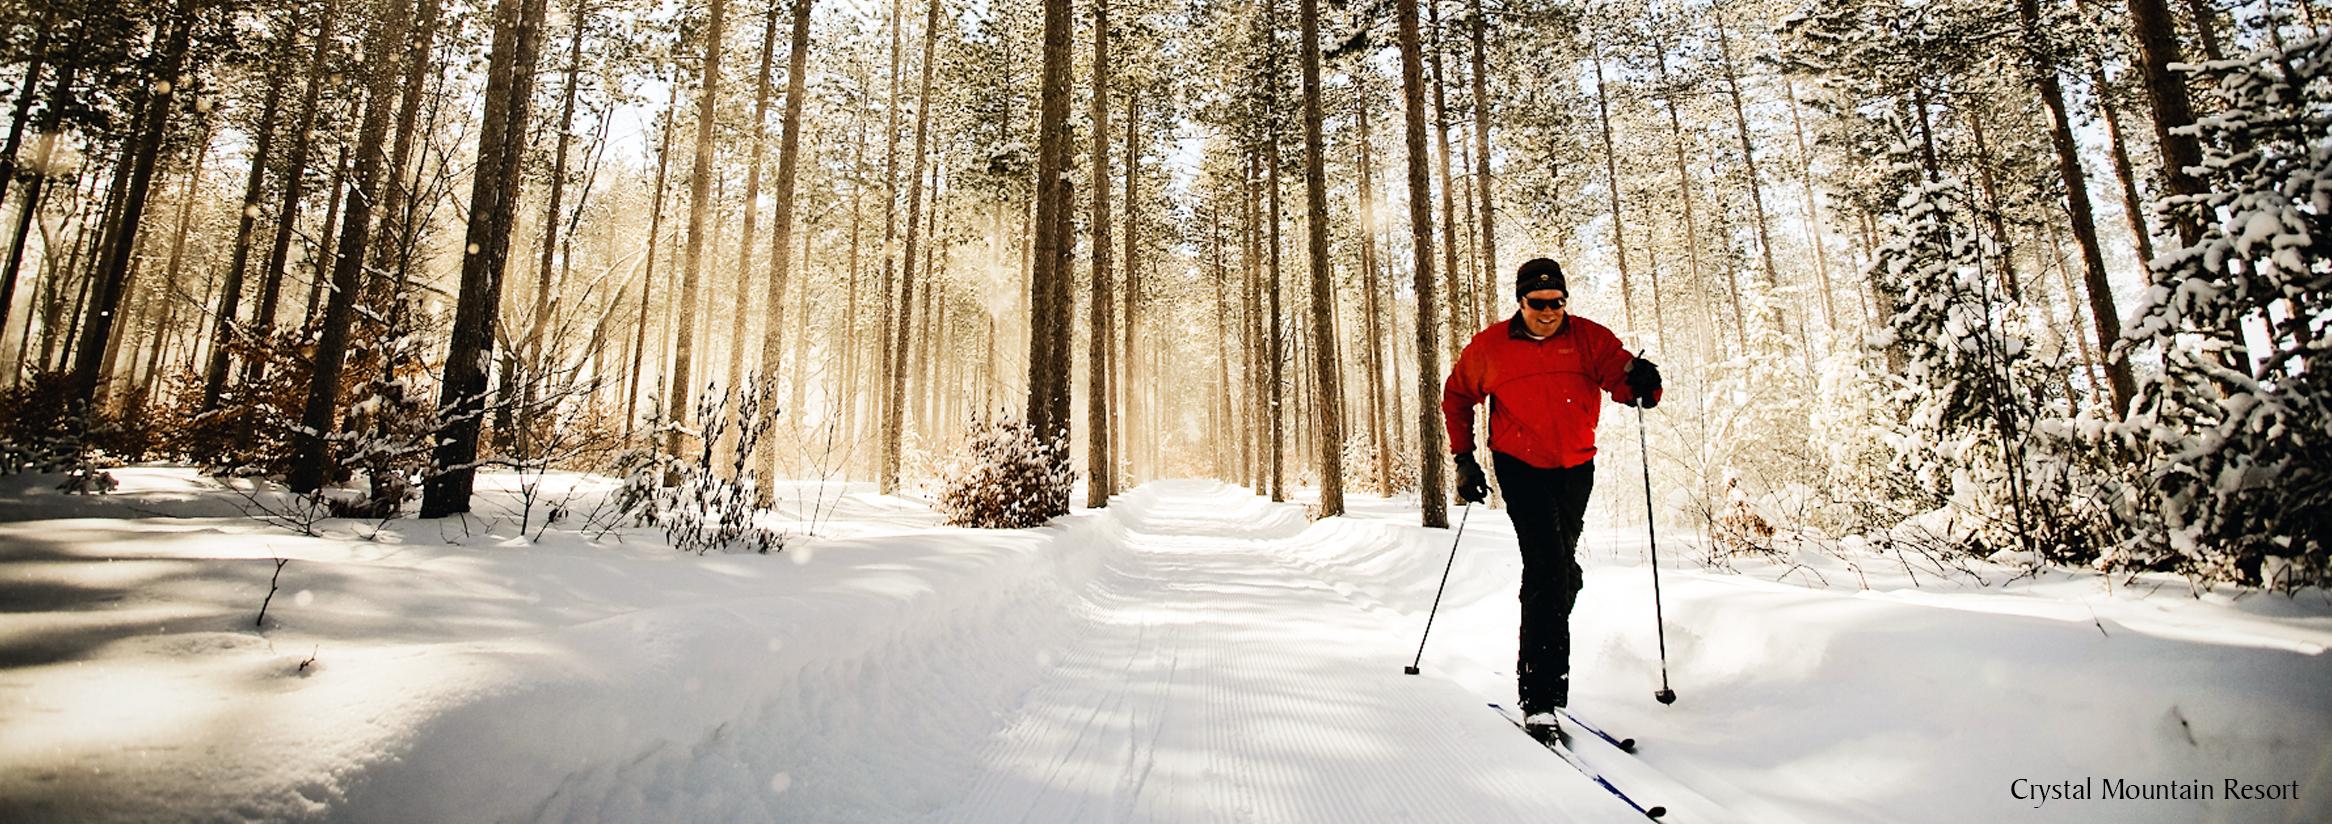 Snow-Sports.jpg